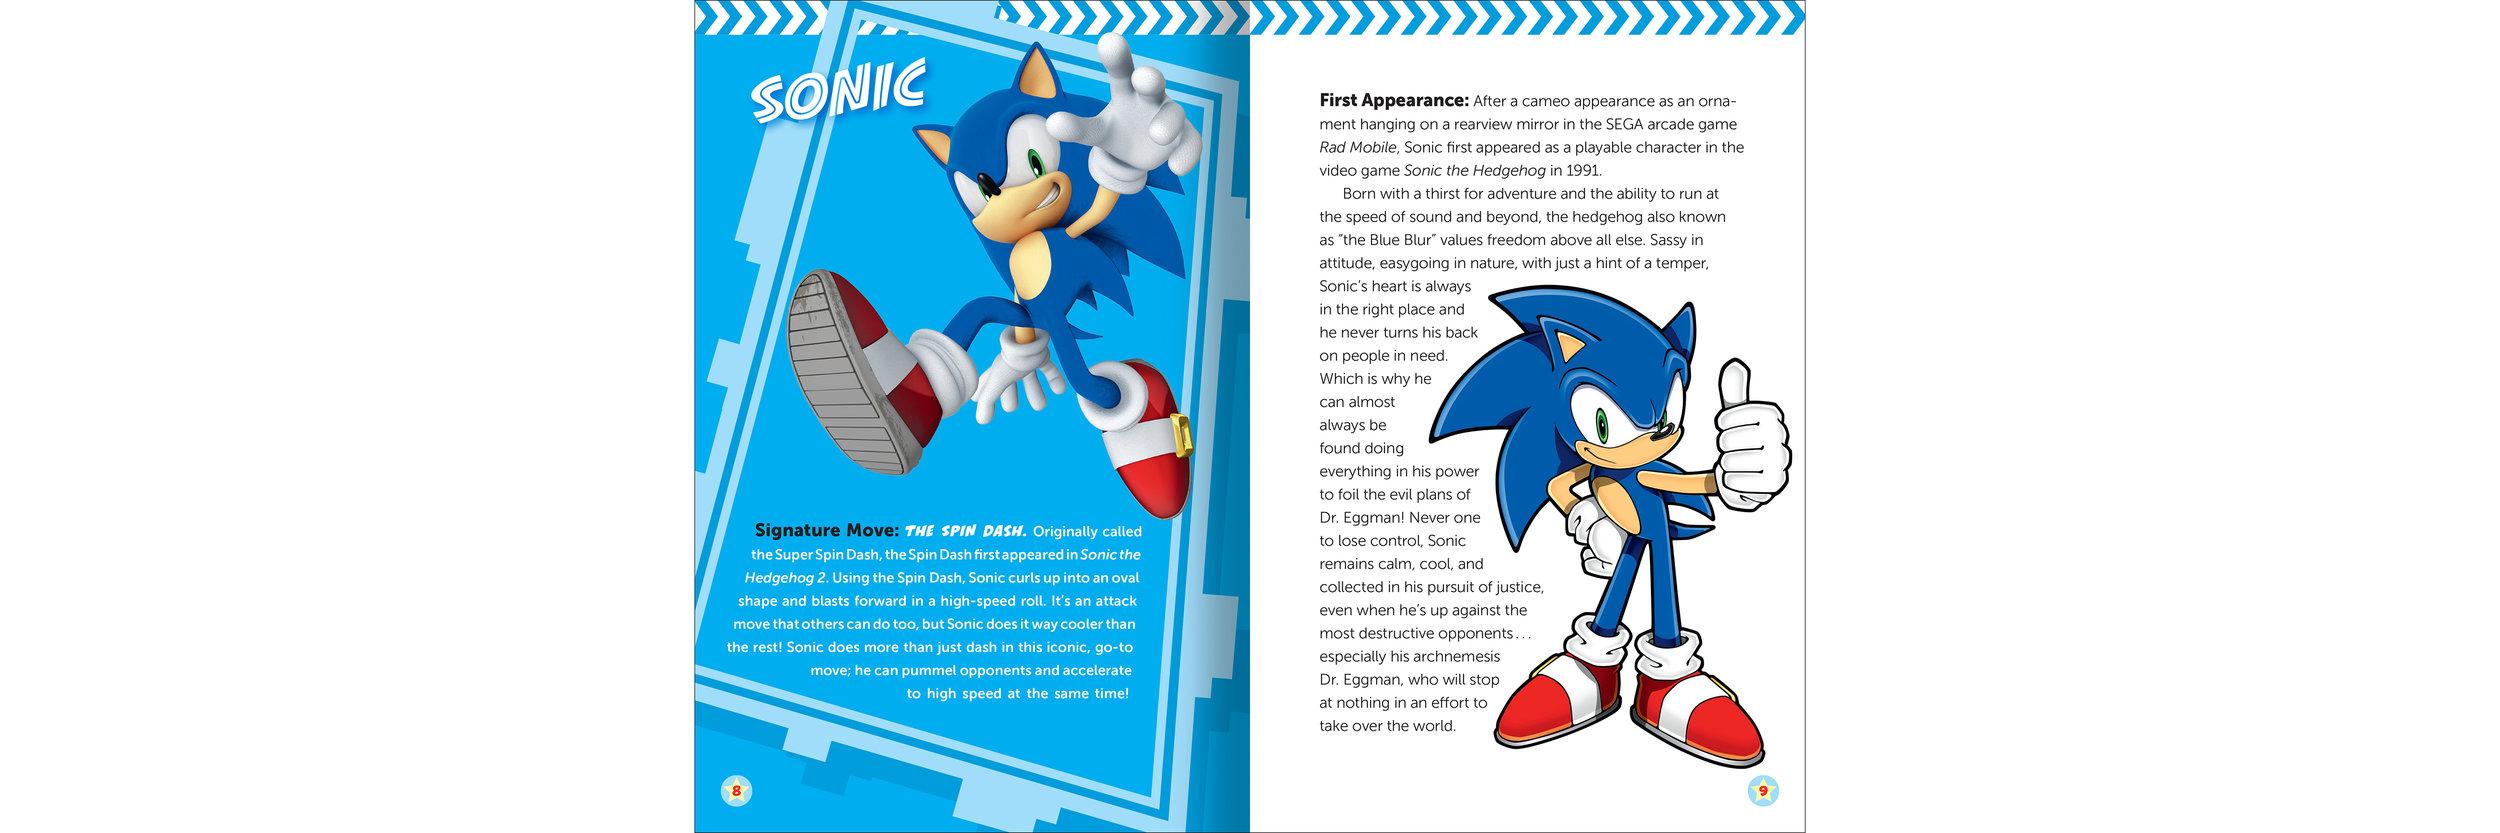 Sonic Char-2-int.jpg